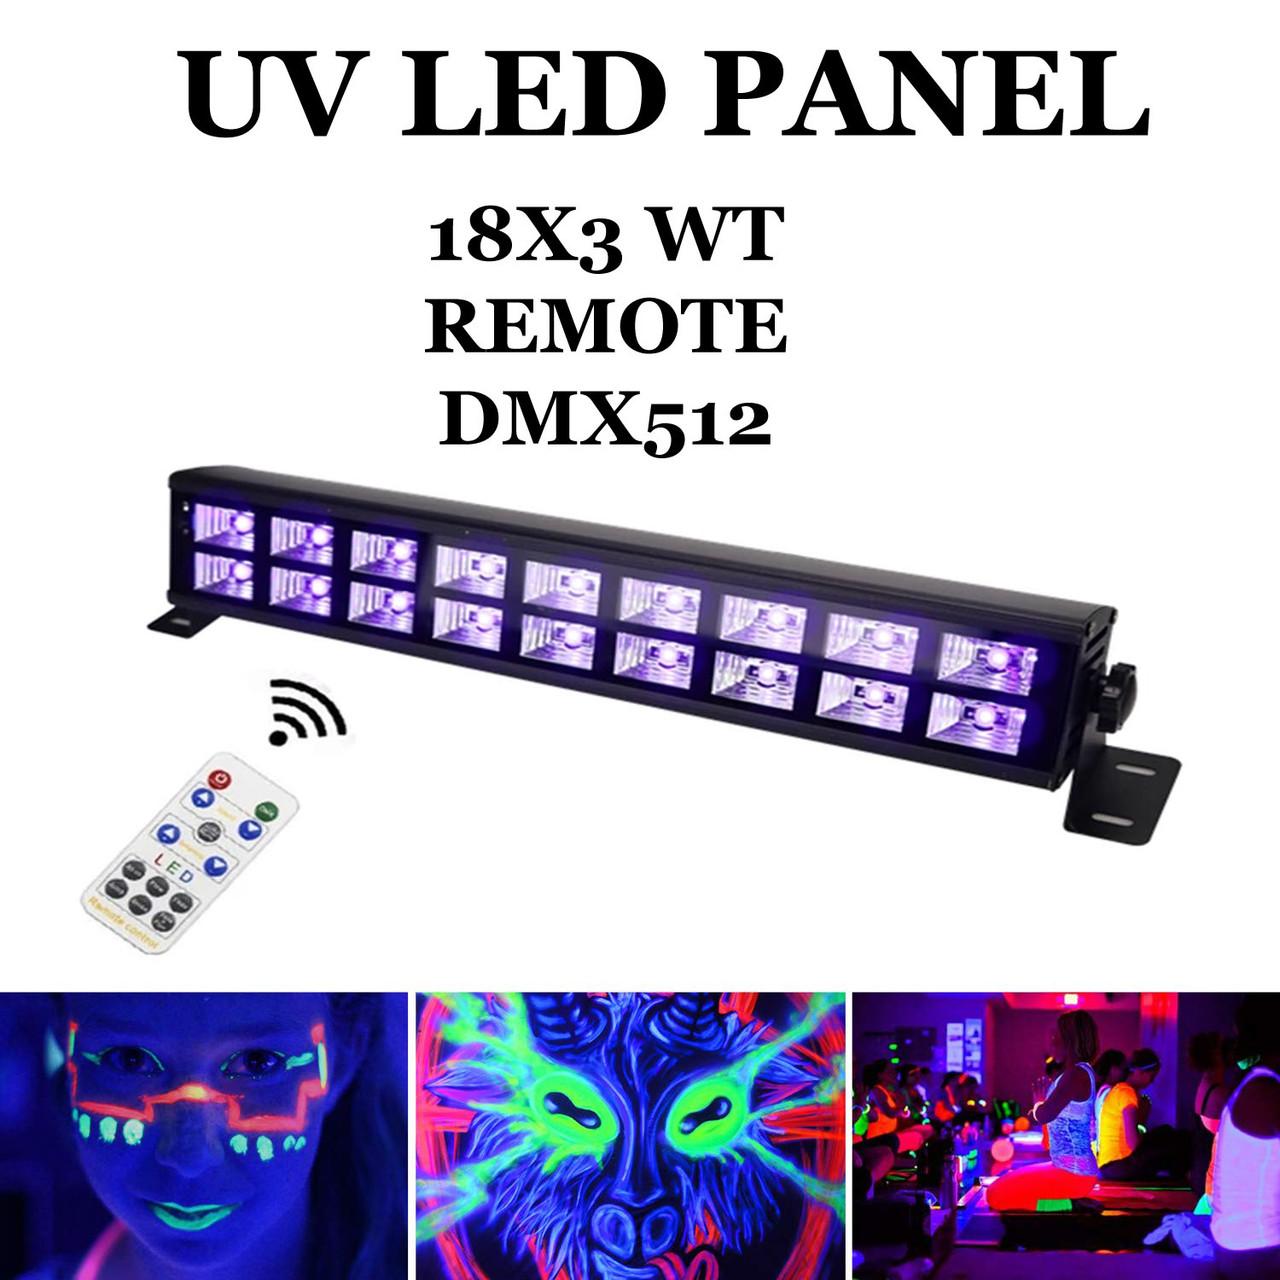 Led UV панель 18х3 Вт с пультом ДУ DMX512